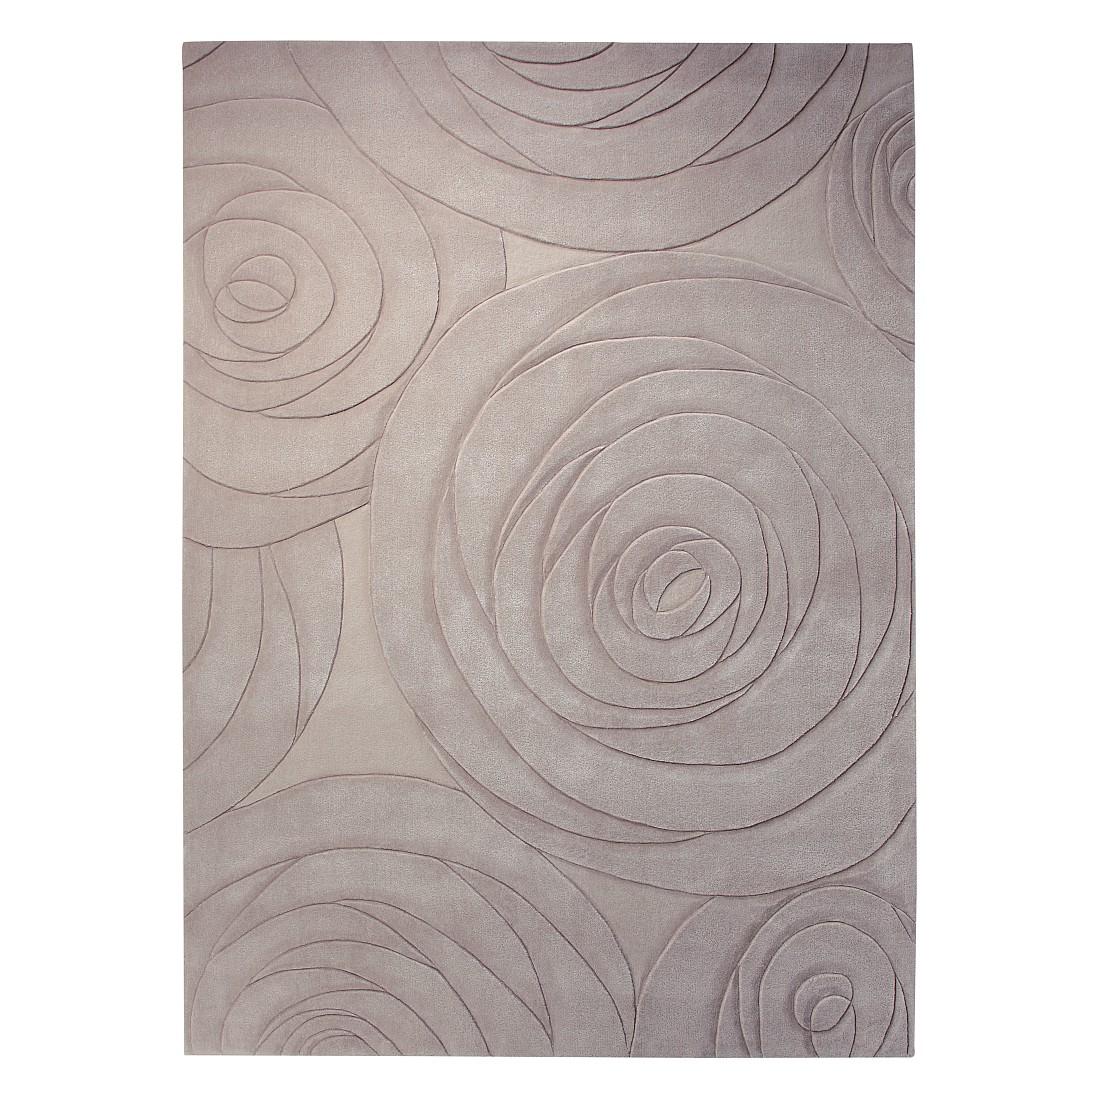 Teppich ESPRIT Carving Art - Blüten/Beige - 200 x 300cm, Esprit Home